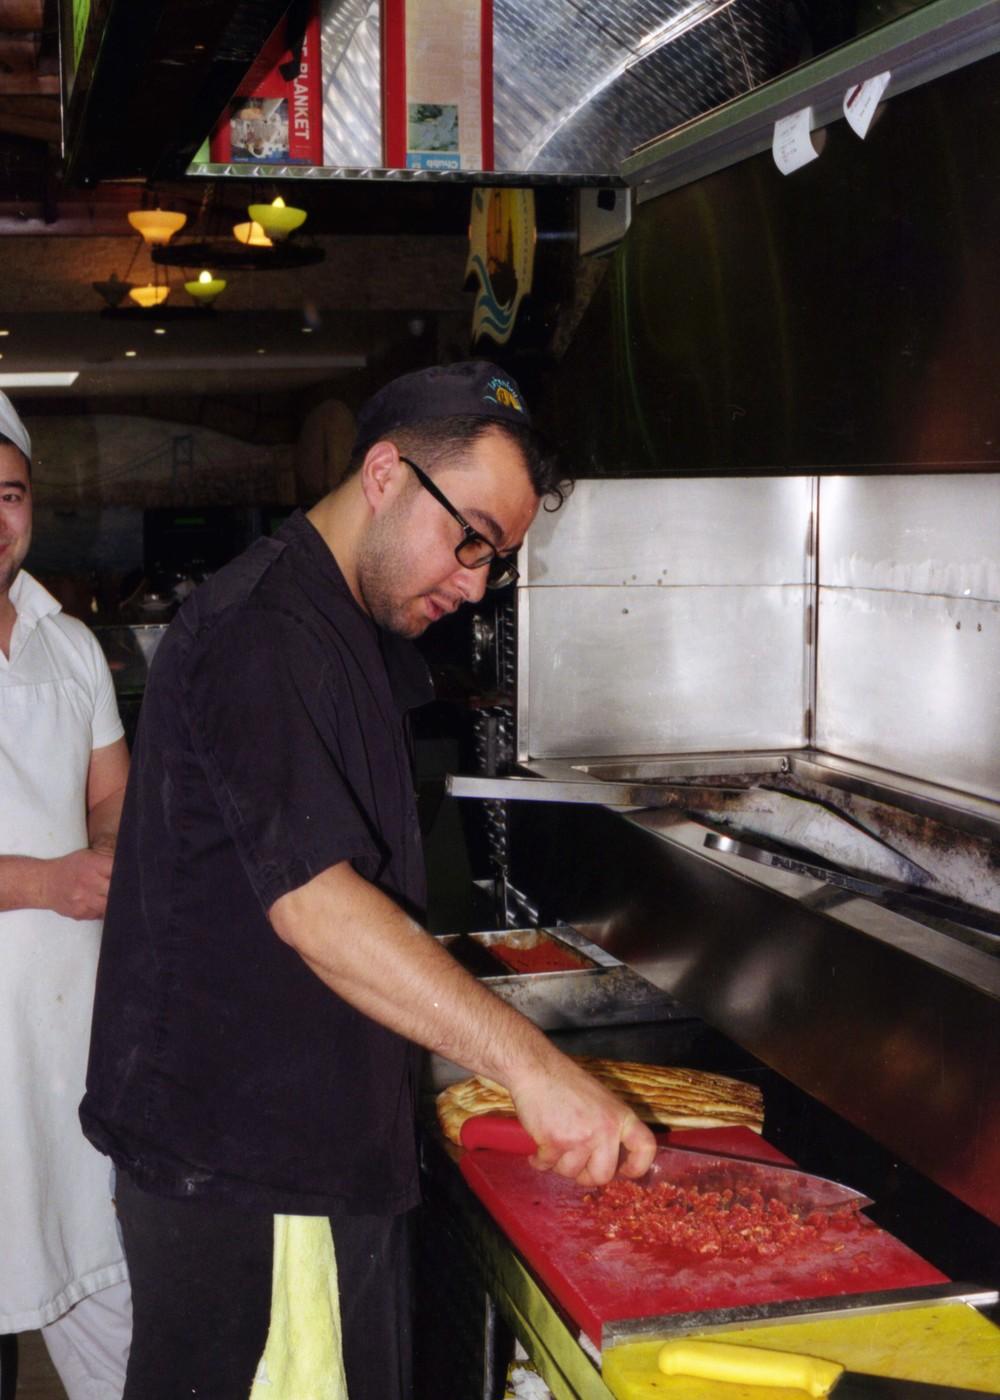 chef_1 11.jpg